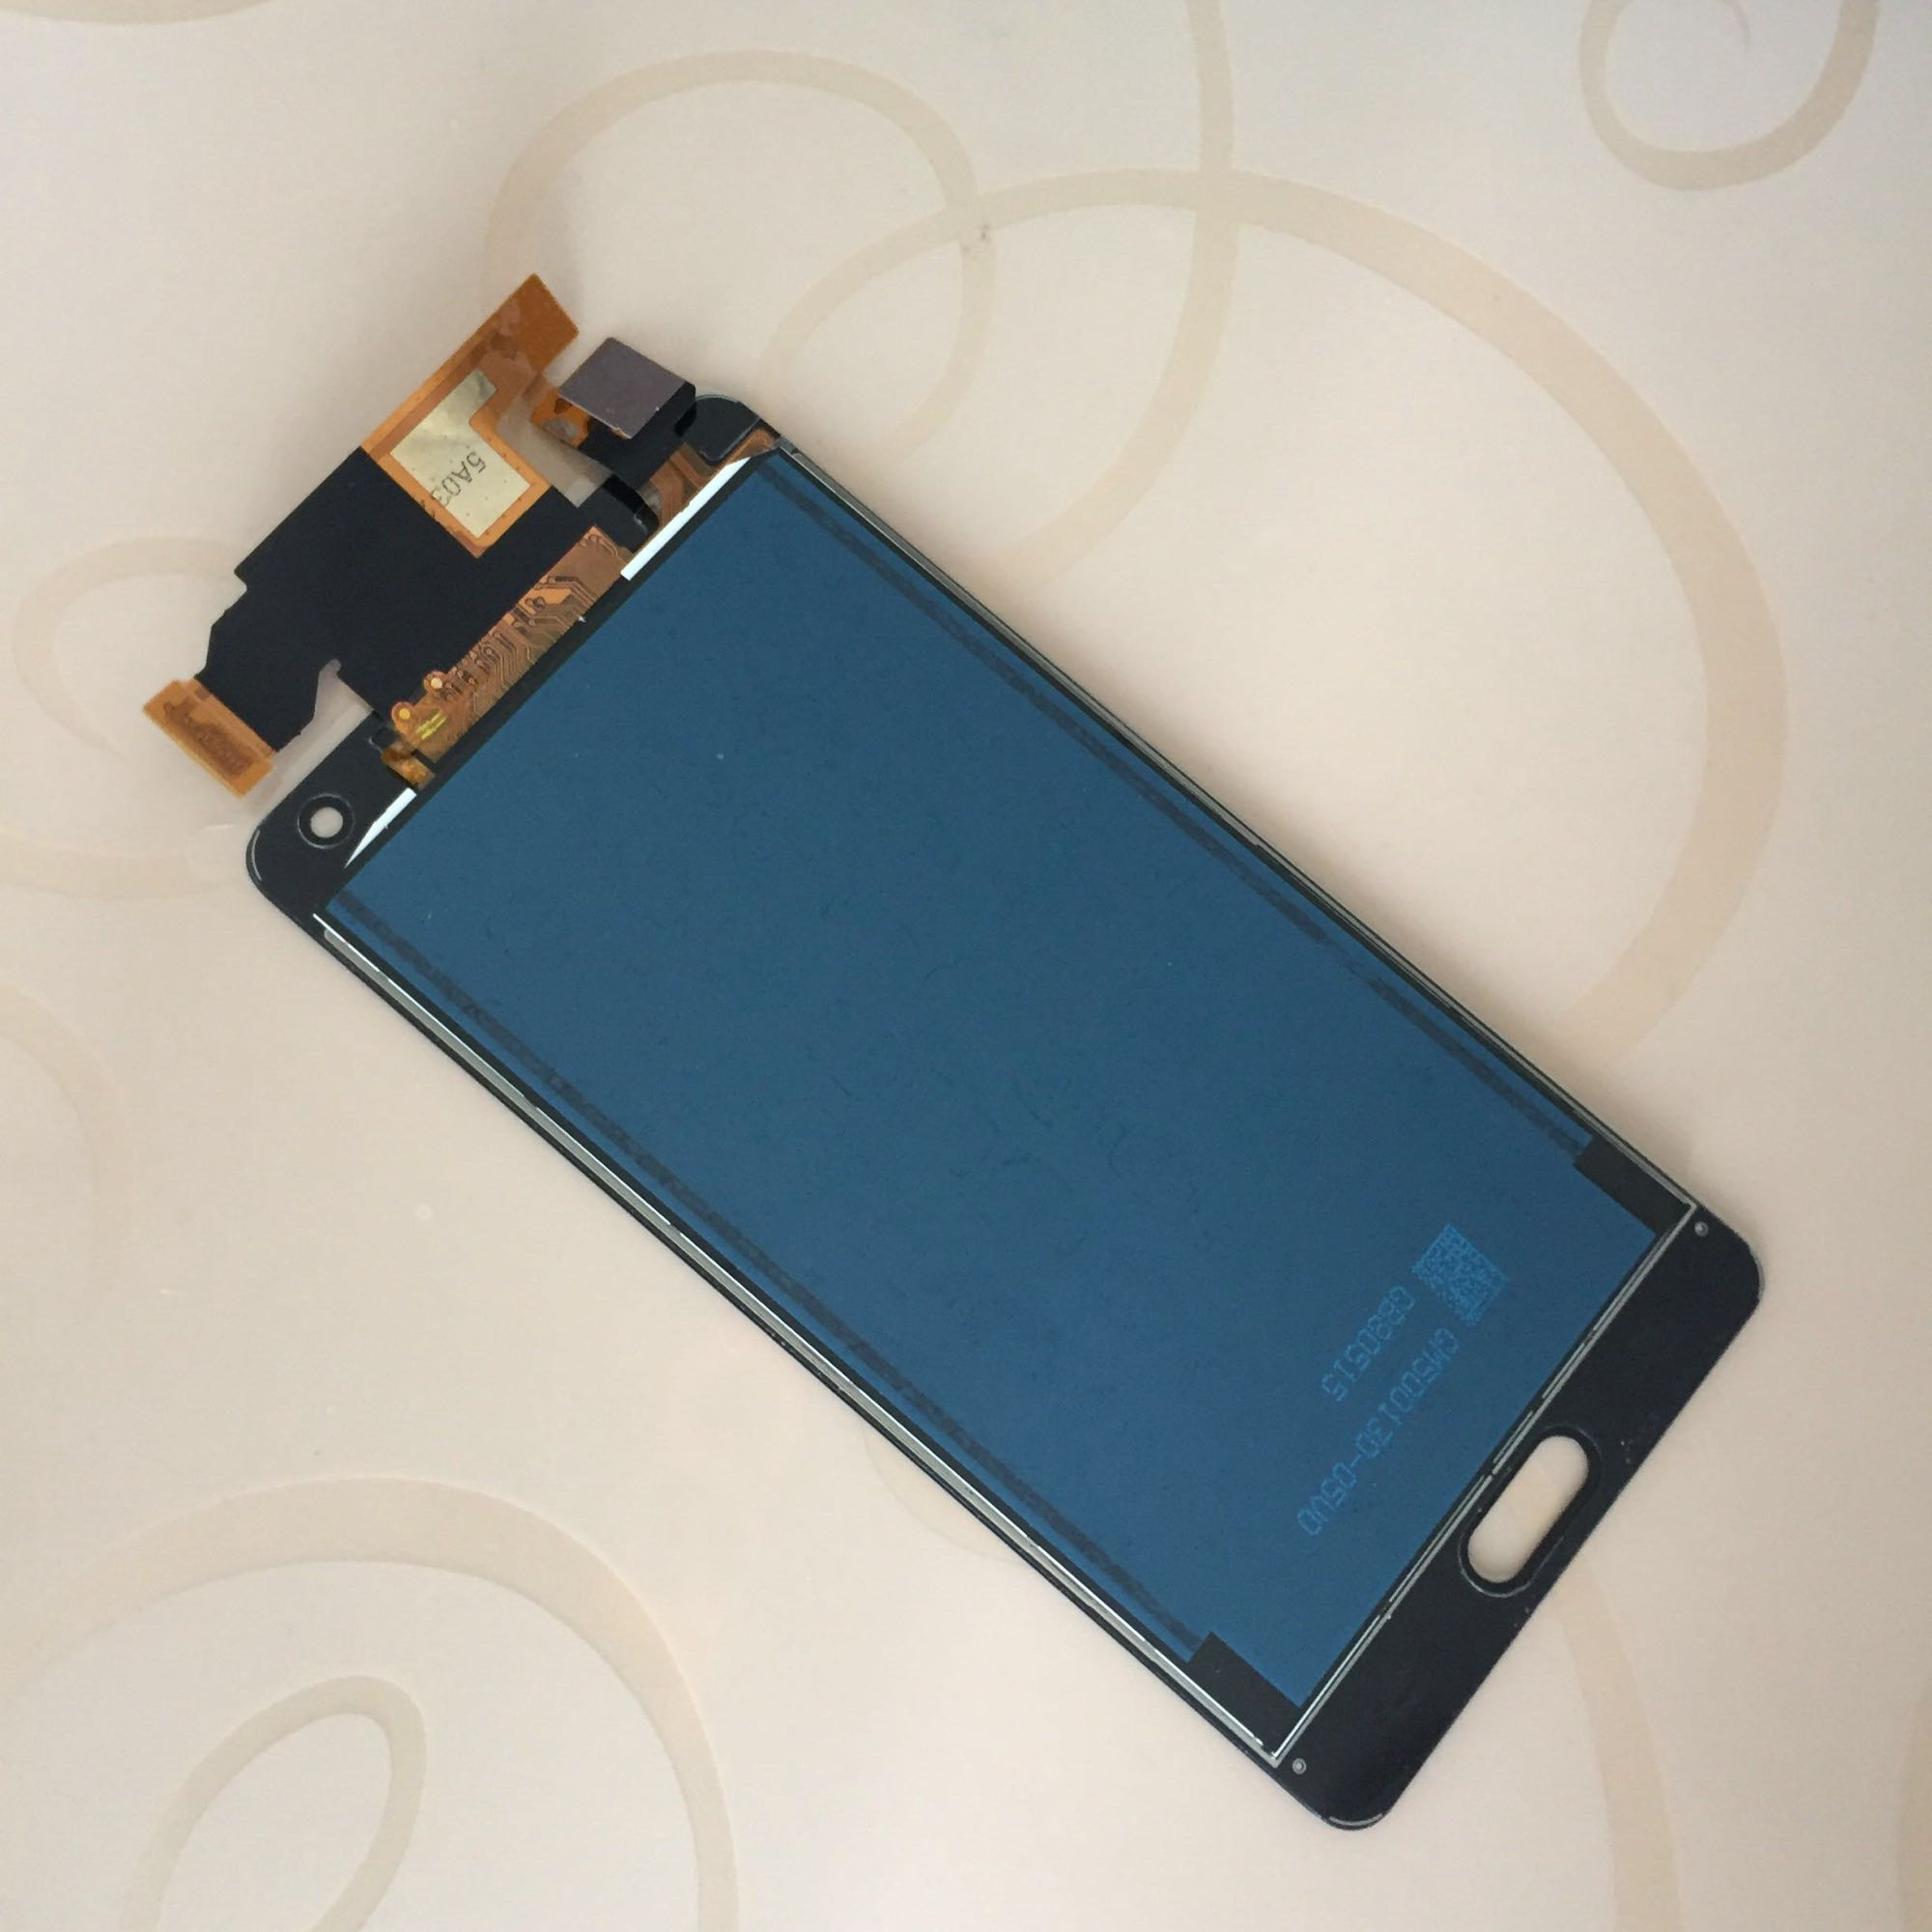 Brightness Adjustable Gold For Samsung Galaxy A5 2015 A500 SM A500F A500H A500FU A500M DS